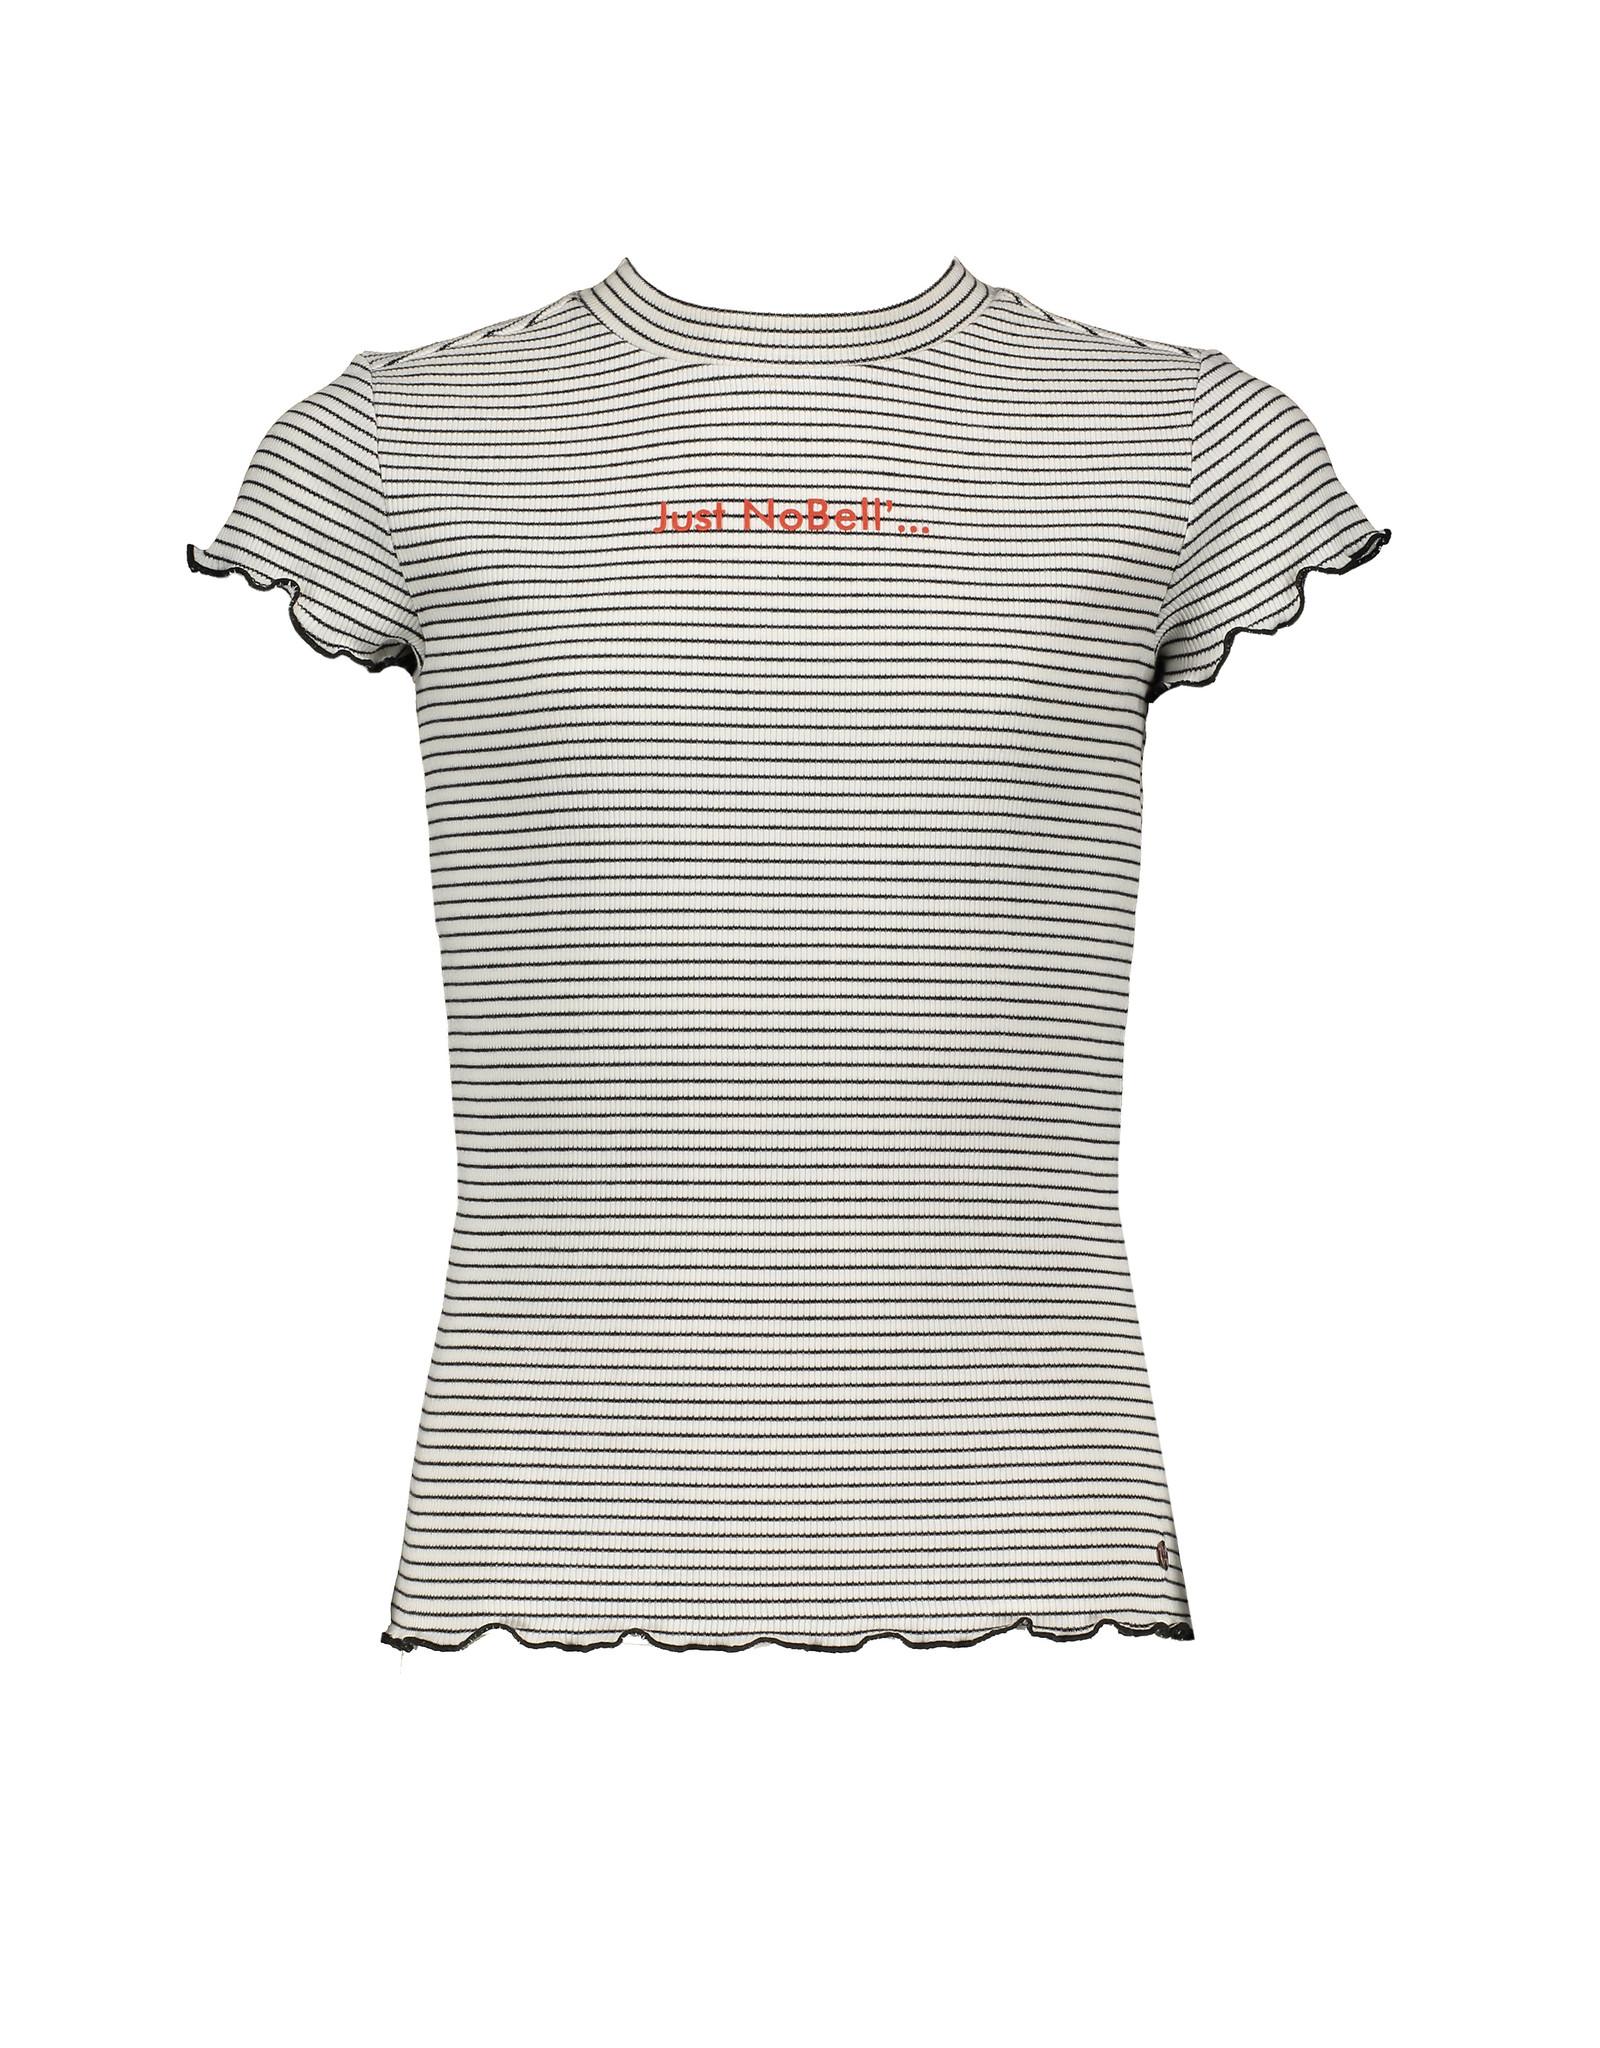 Nobell' Ribbed t-shirt 'just Nobell'